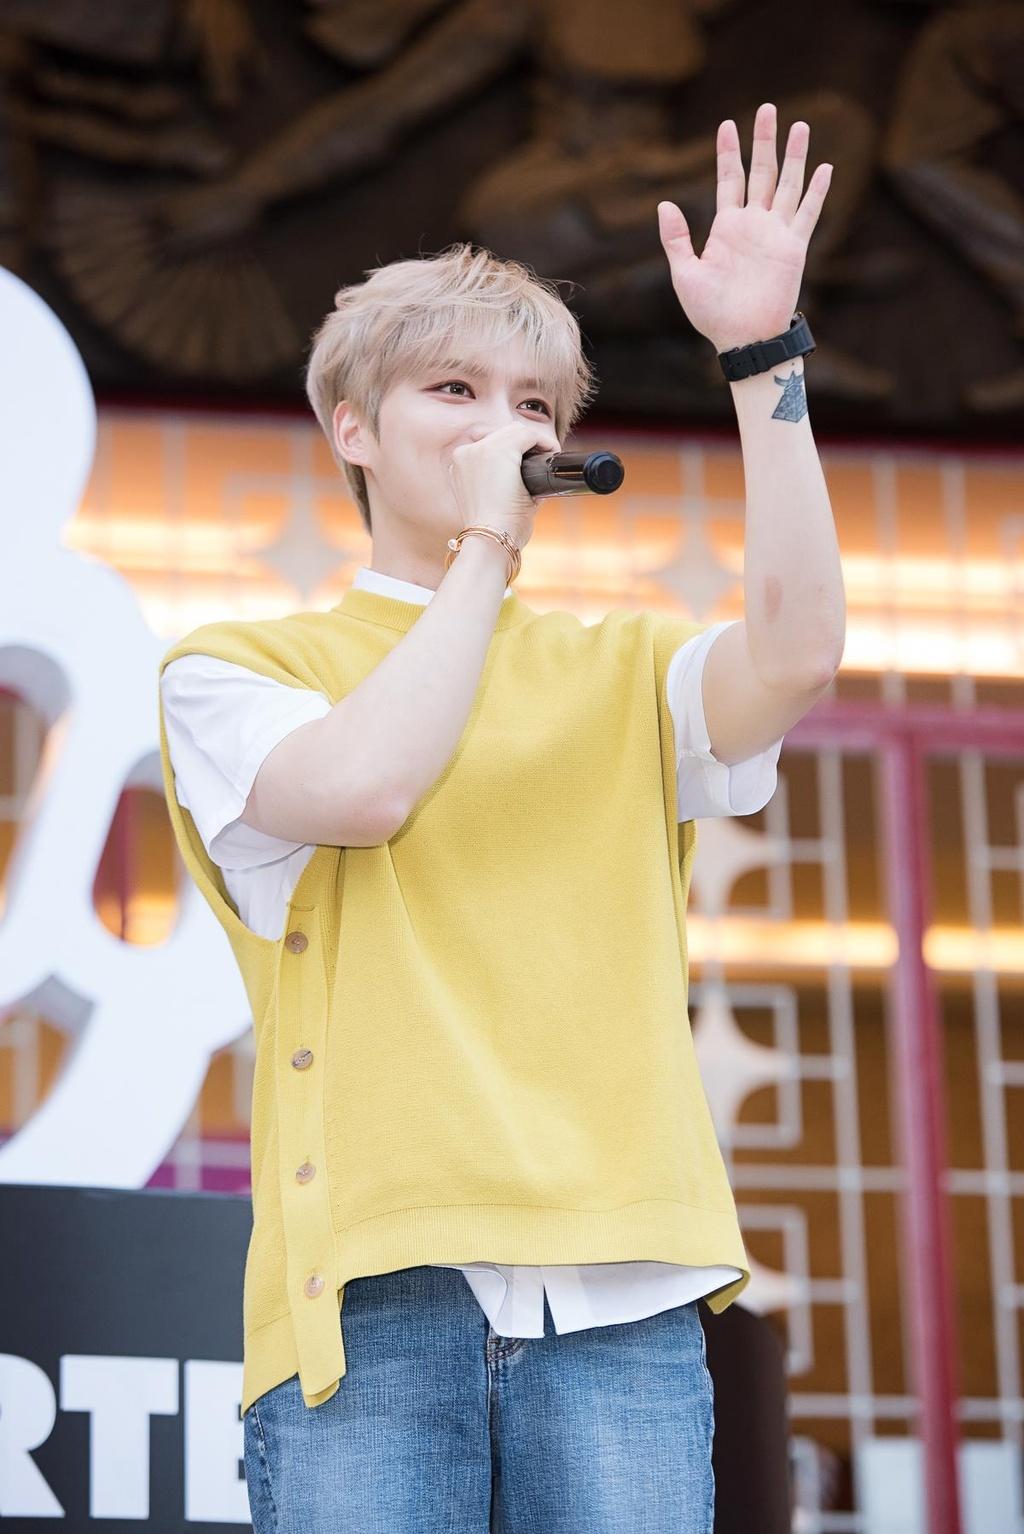 Hyomin lien tuc high-five, Kim Jaejong ru nguoi ham mo Viet selfie hinh anh 7